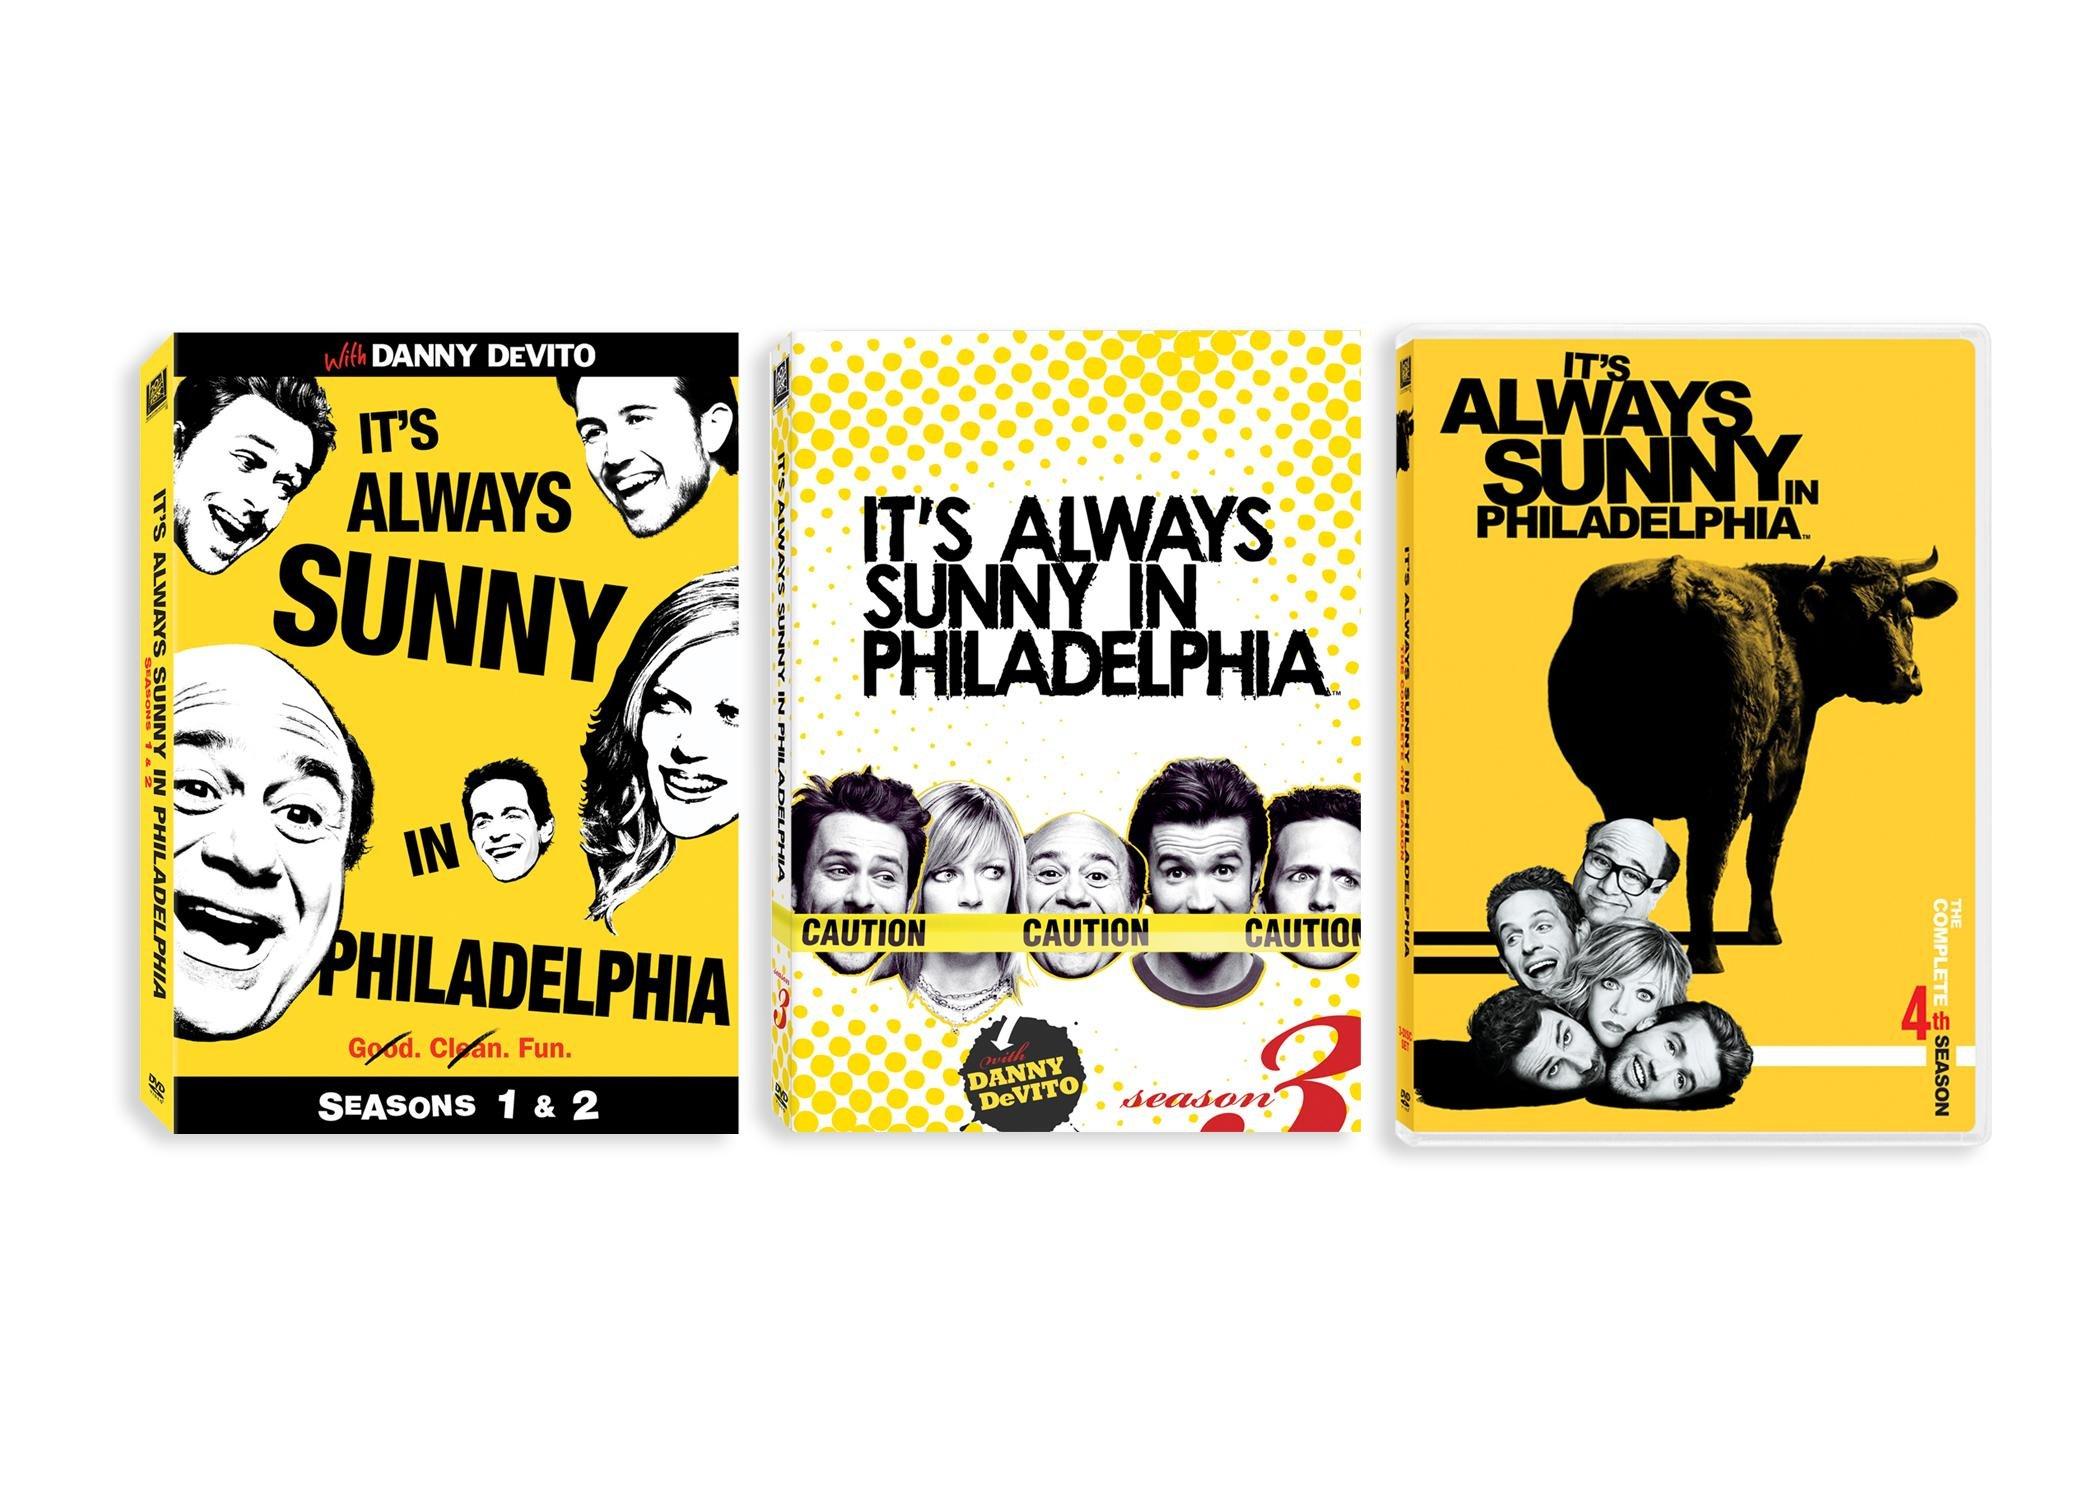 It's Always Sunny in Philadelphia: Seasons 1-4 by 20th Century Fox